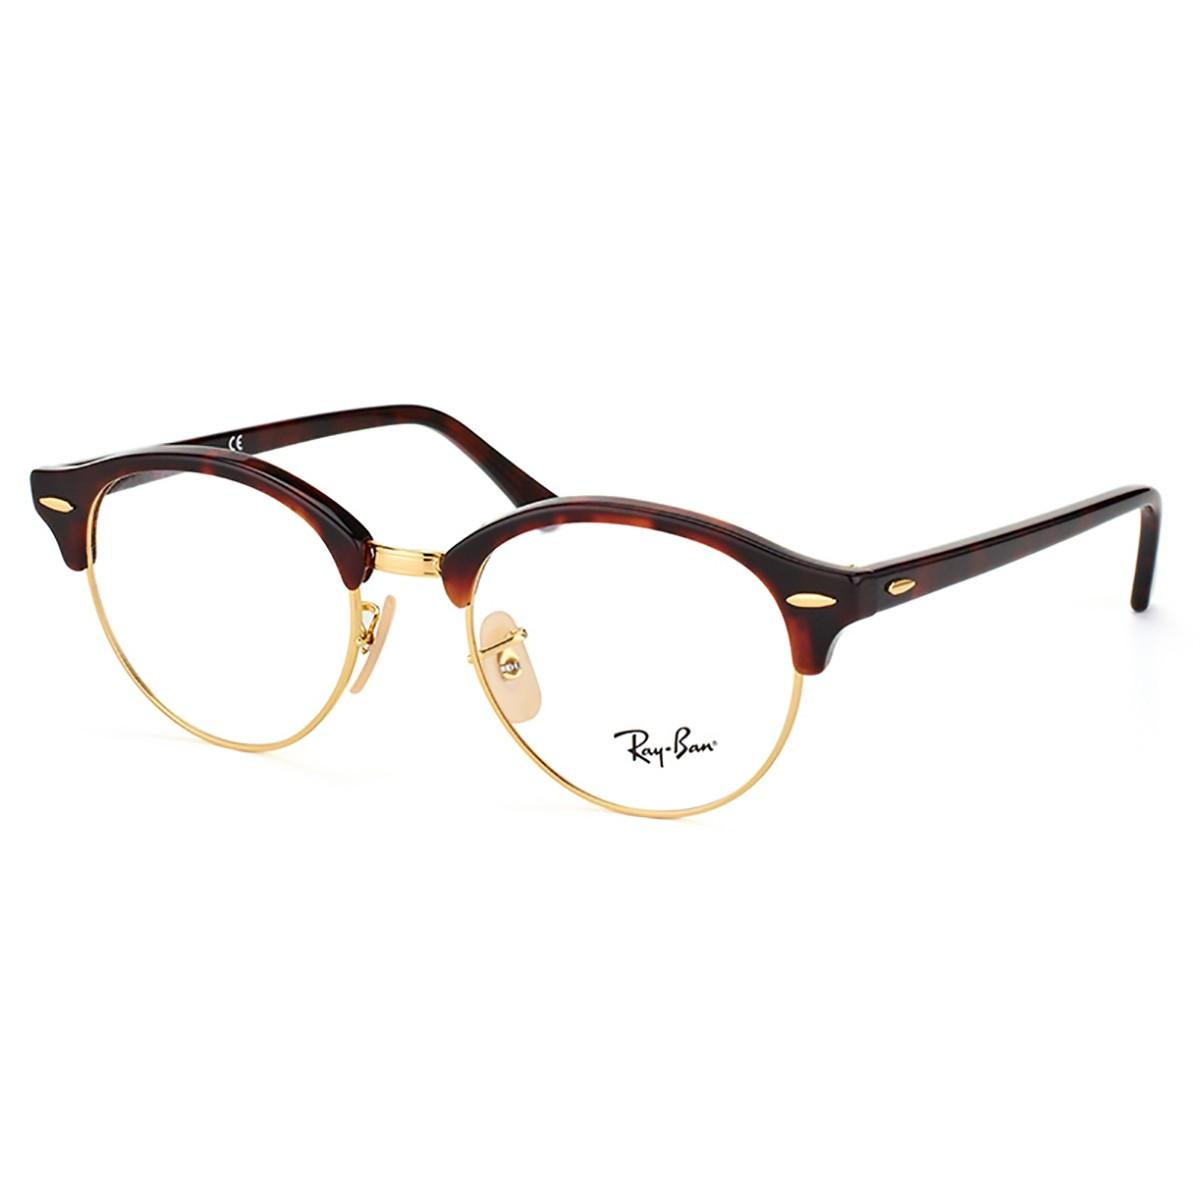 88fa0b16c Óculos de Grau Ray Ban Clubround | Tri-Jóia Shop